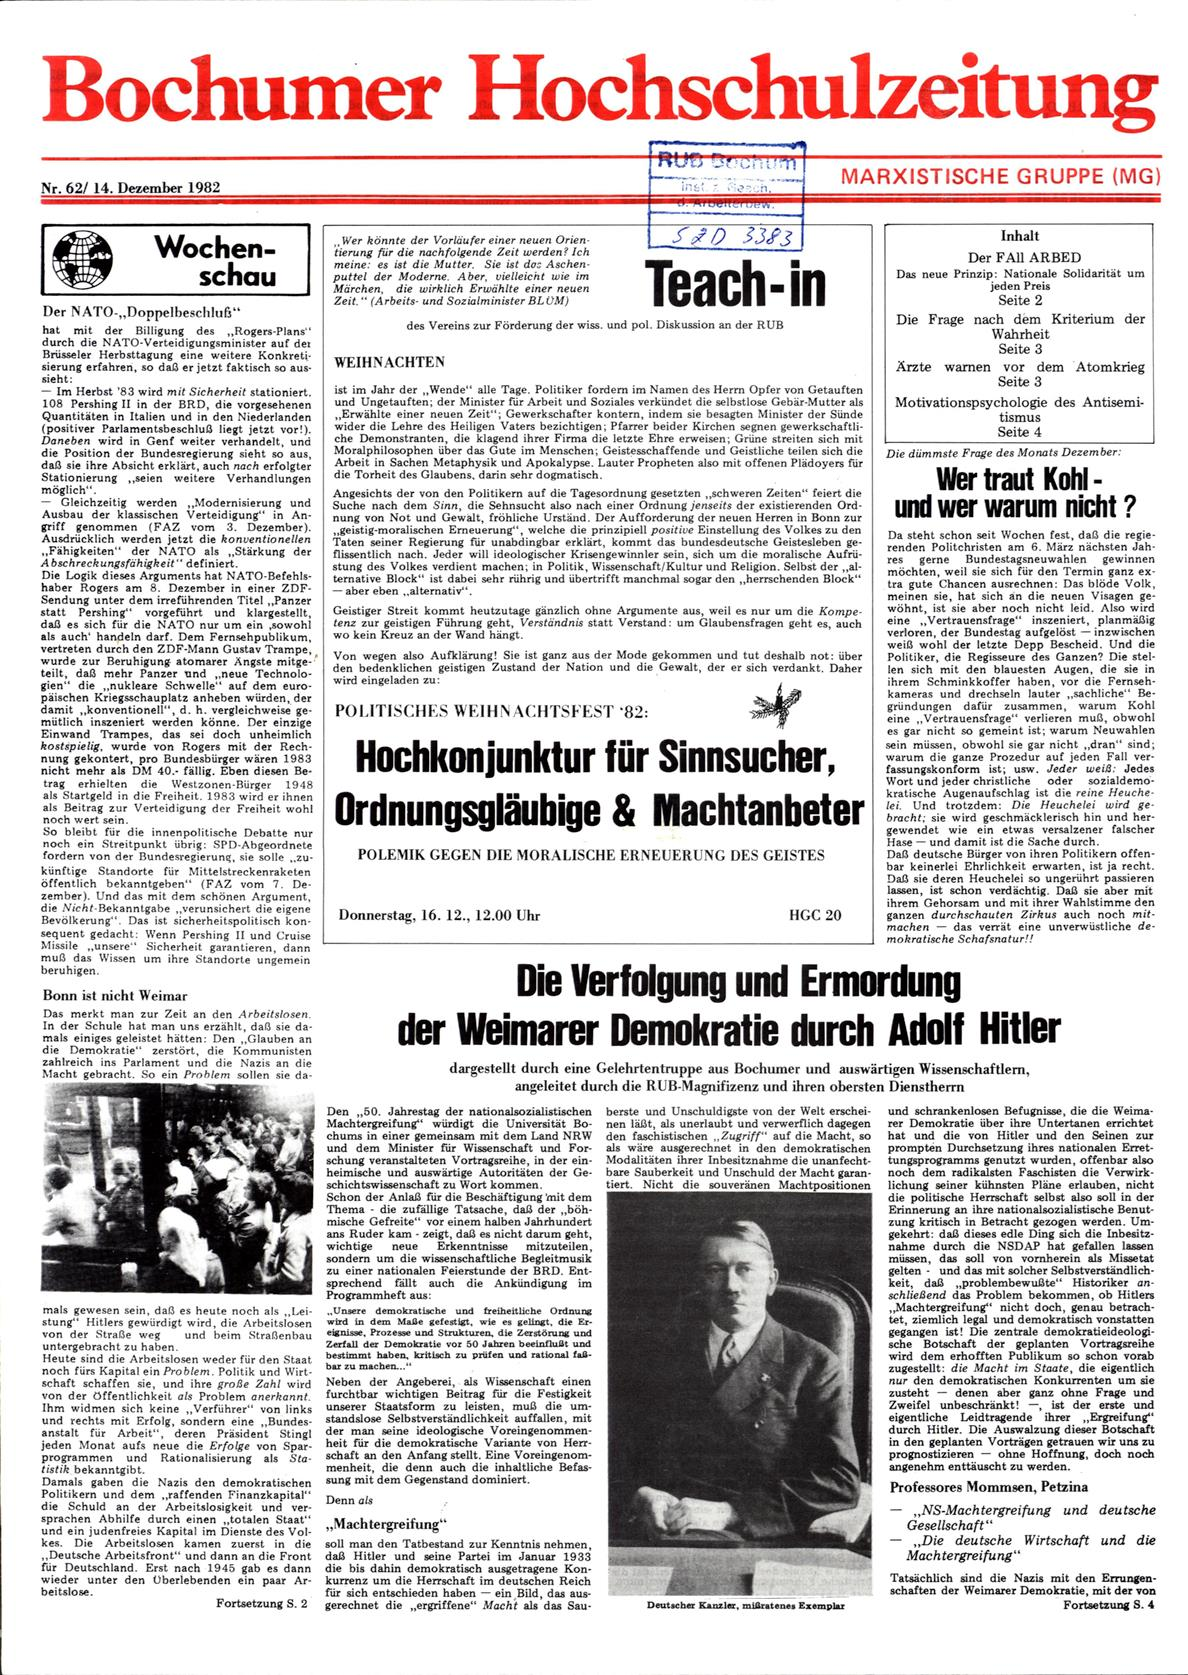 Bochum_BHZ_19821214_062_001